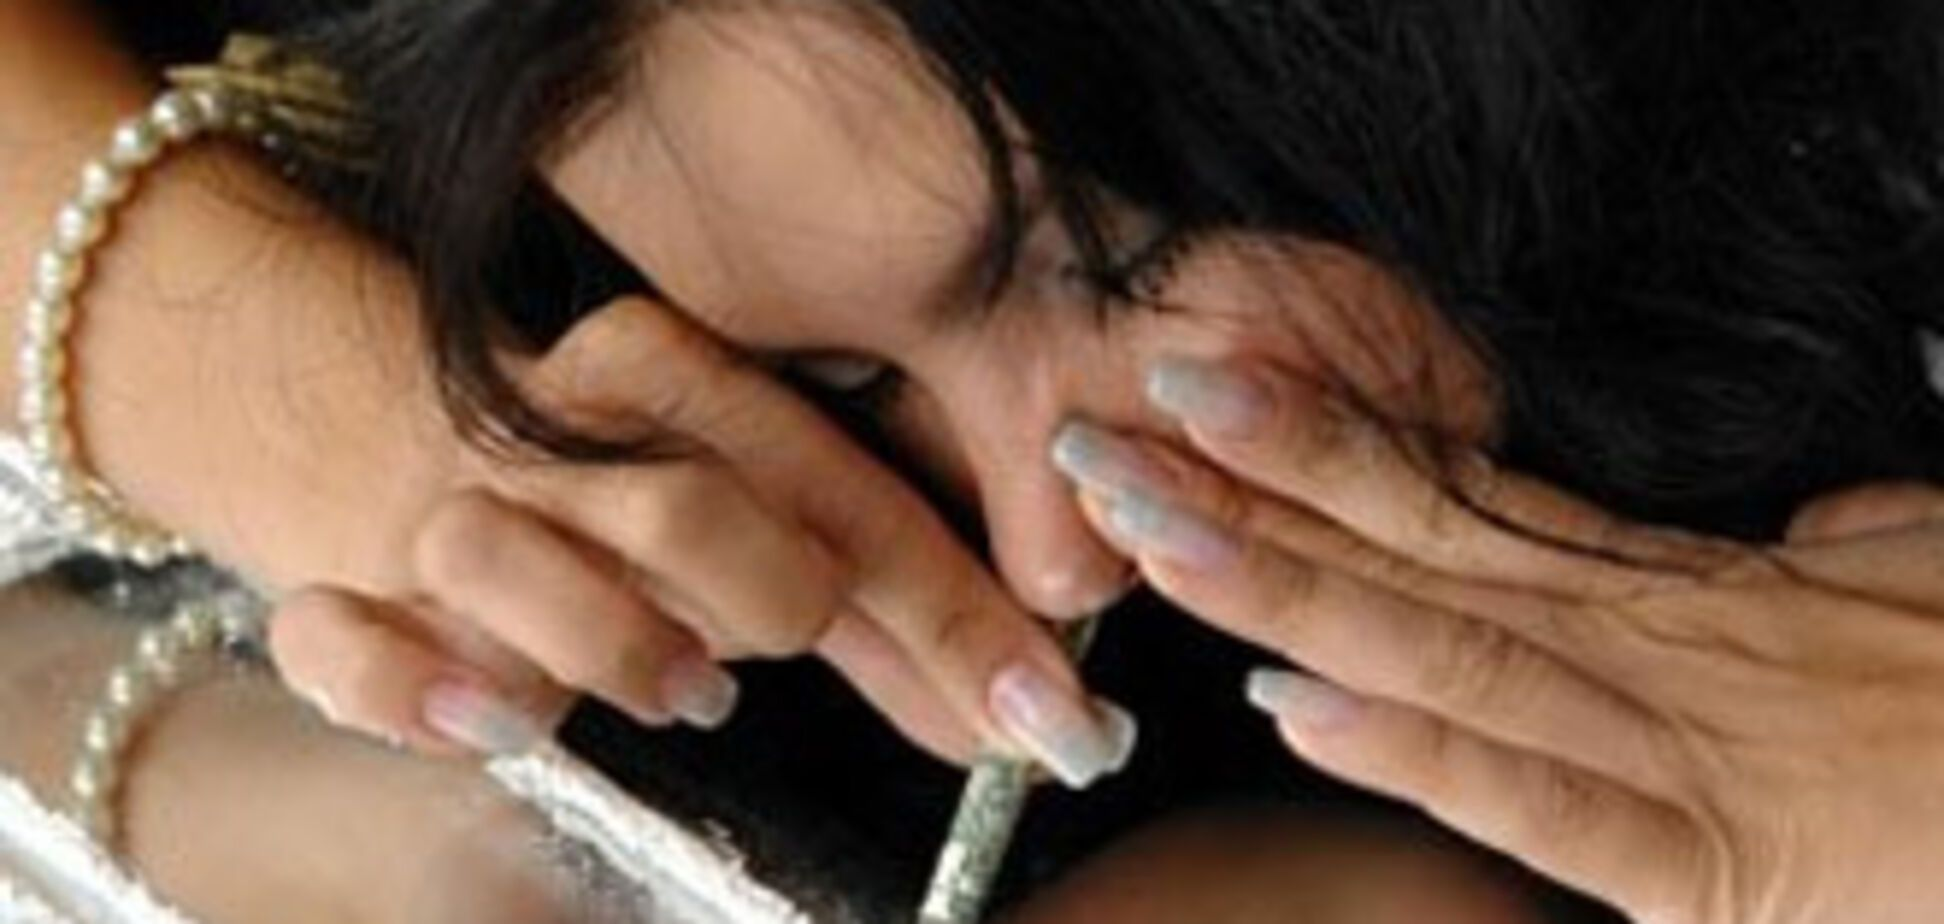 25-летний инвалид соорудил в квартире нарколабораторию